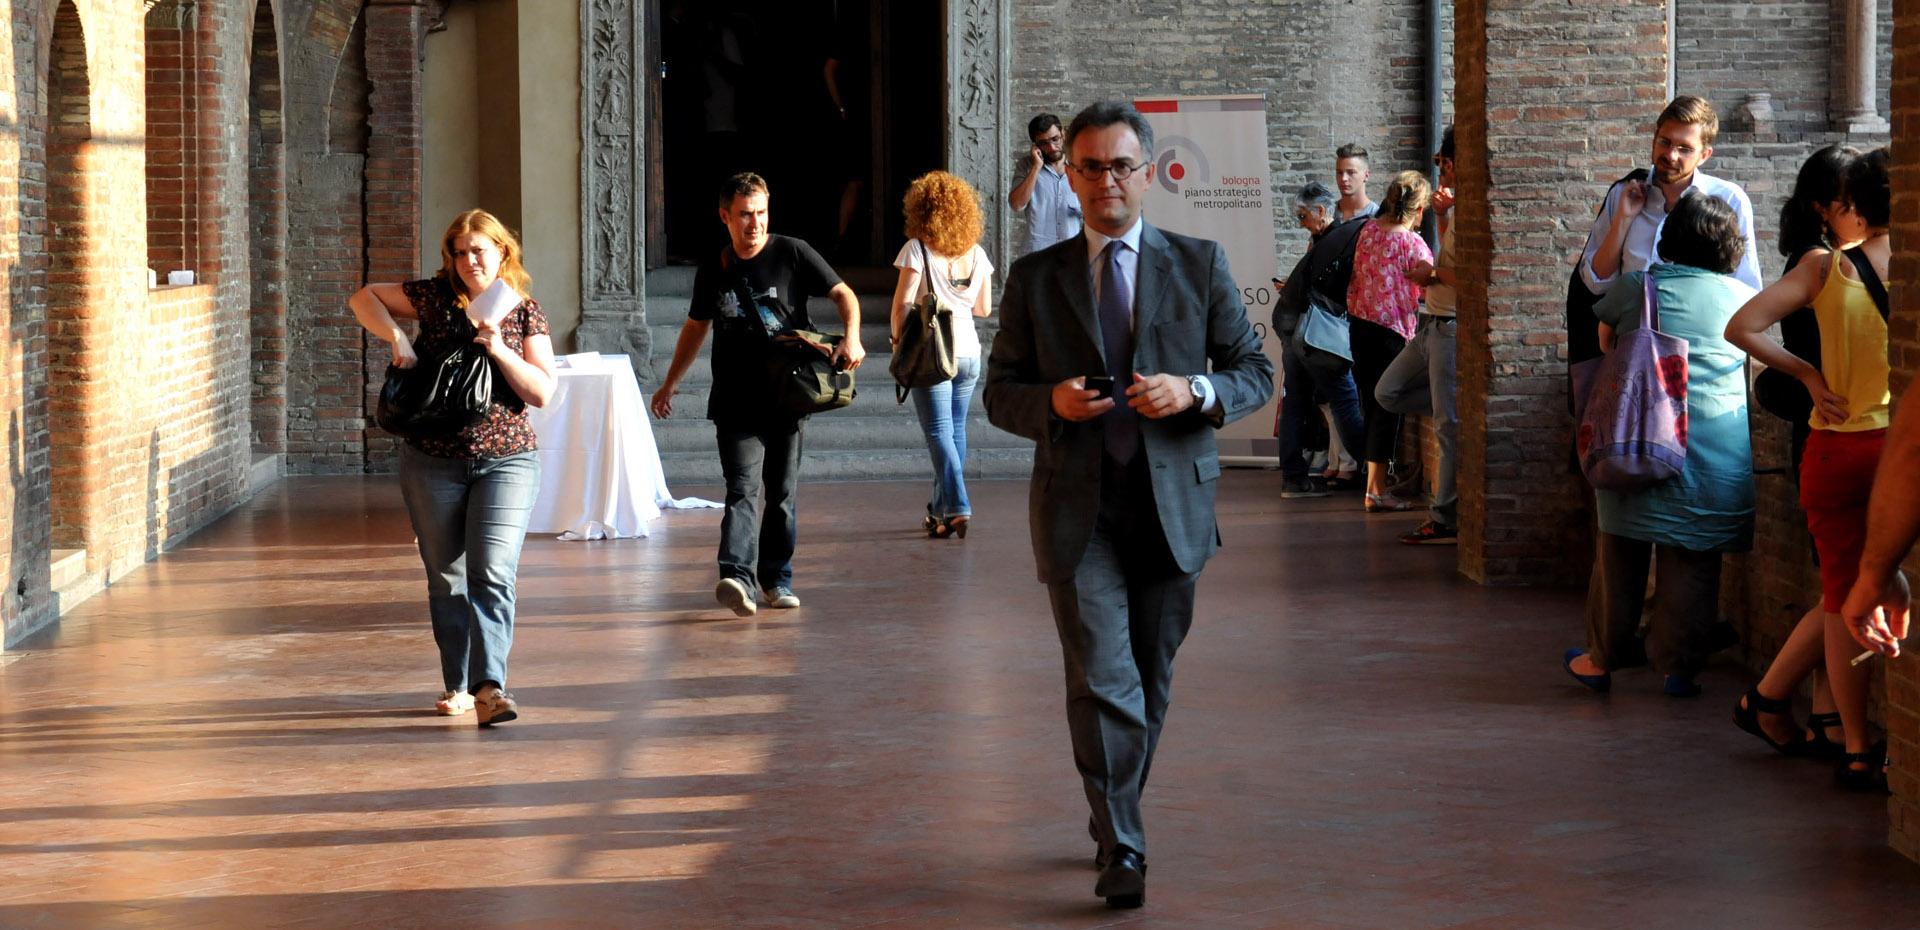 Giacomo Venturi - Archivio Città metropolitana di Bologna